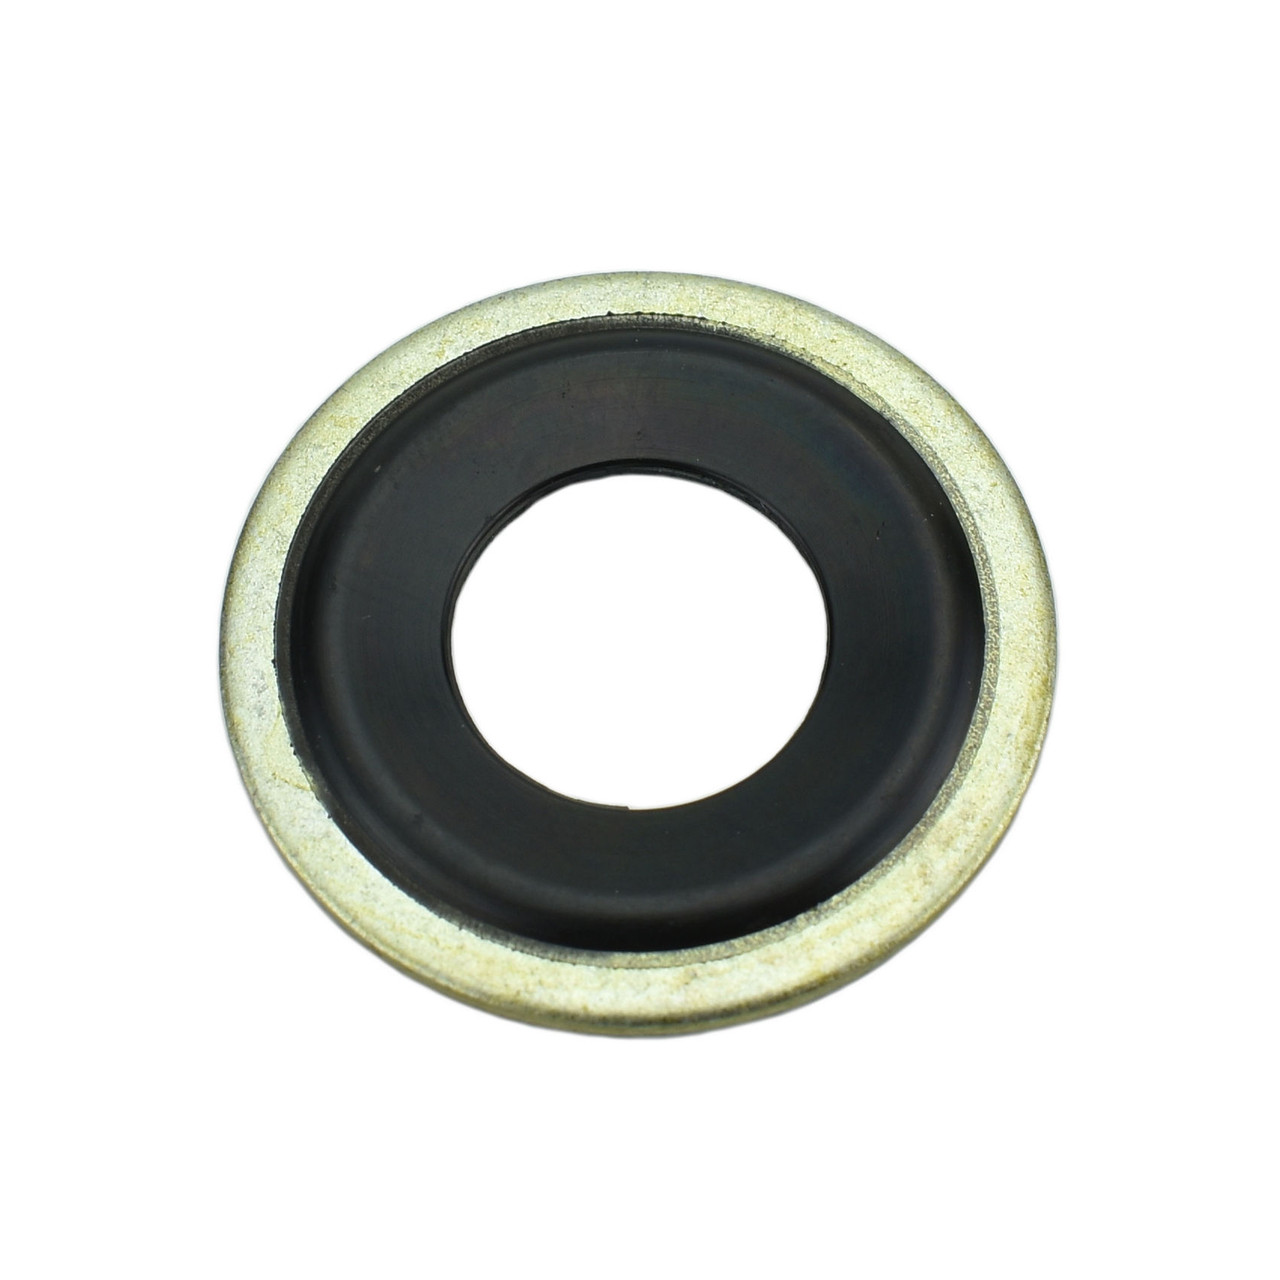 BAS03500 - M12 Metal / Rubber Oil Drain Plug Gaskets